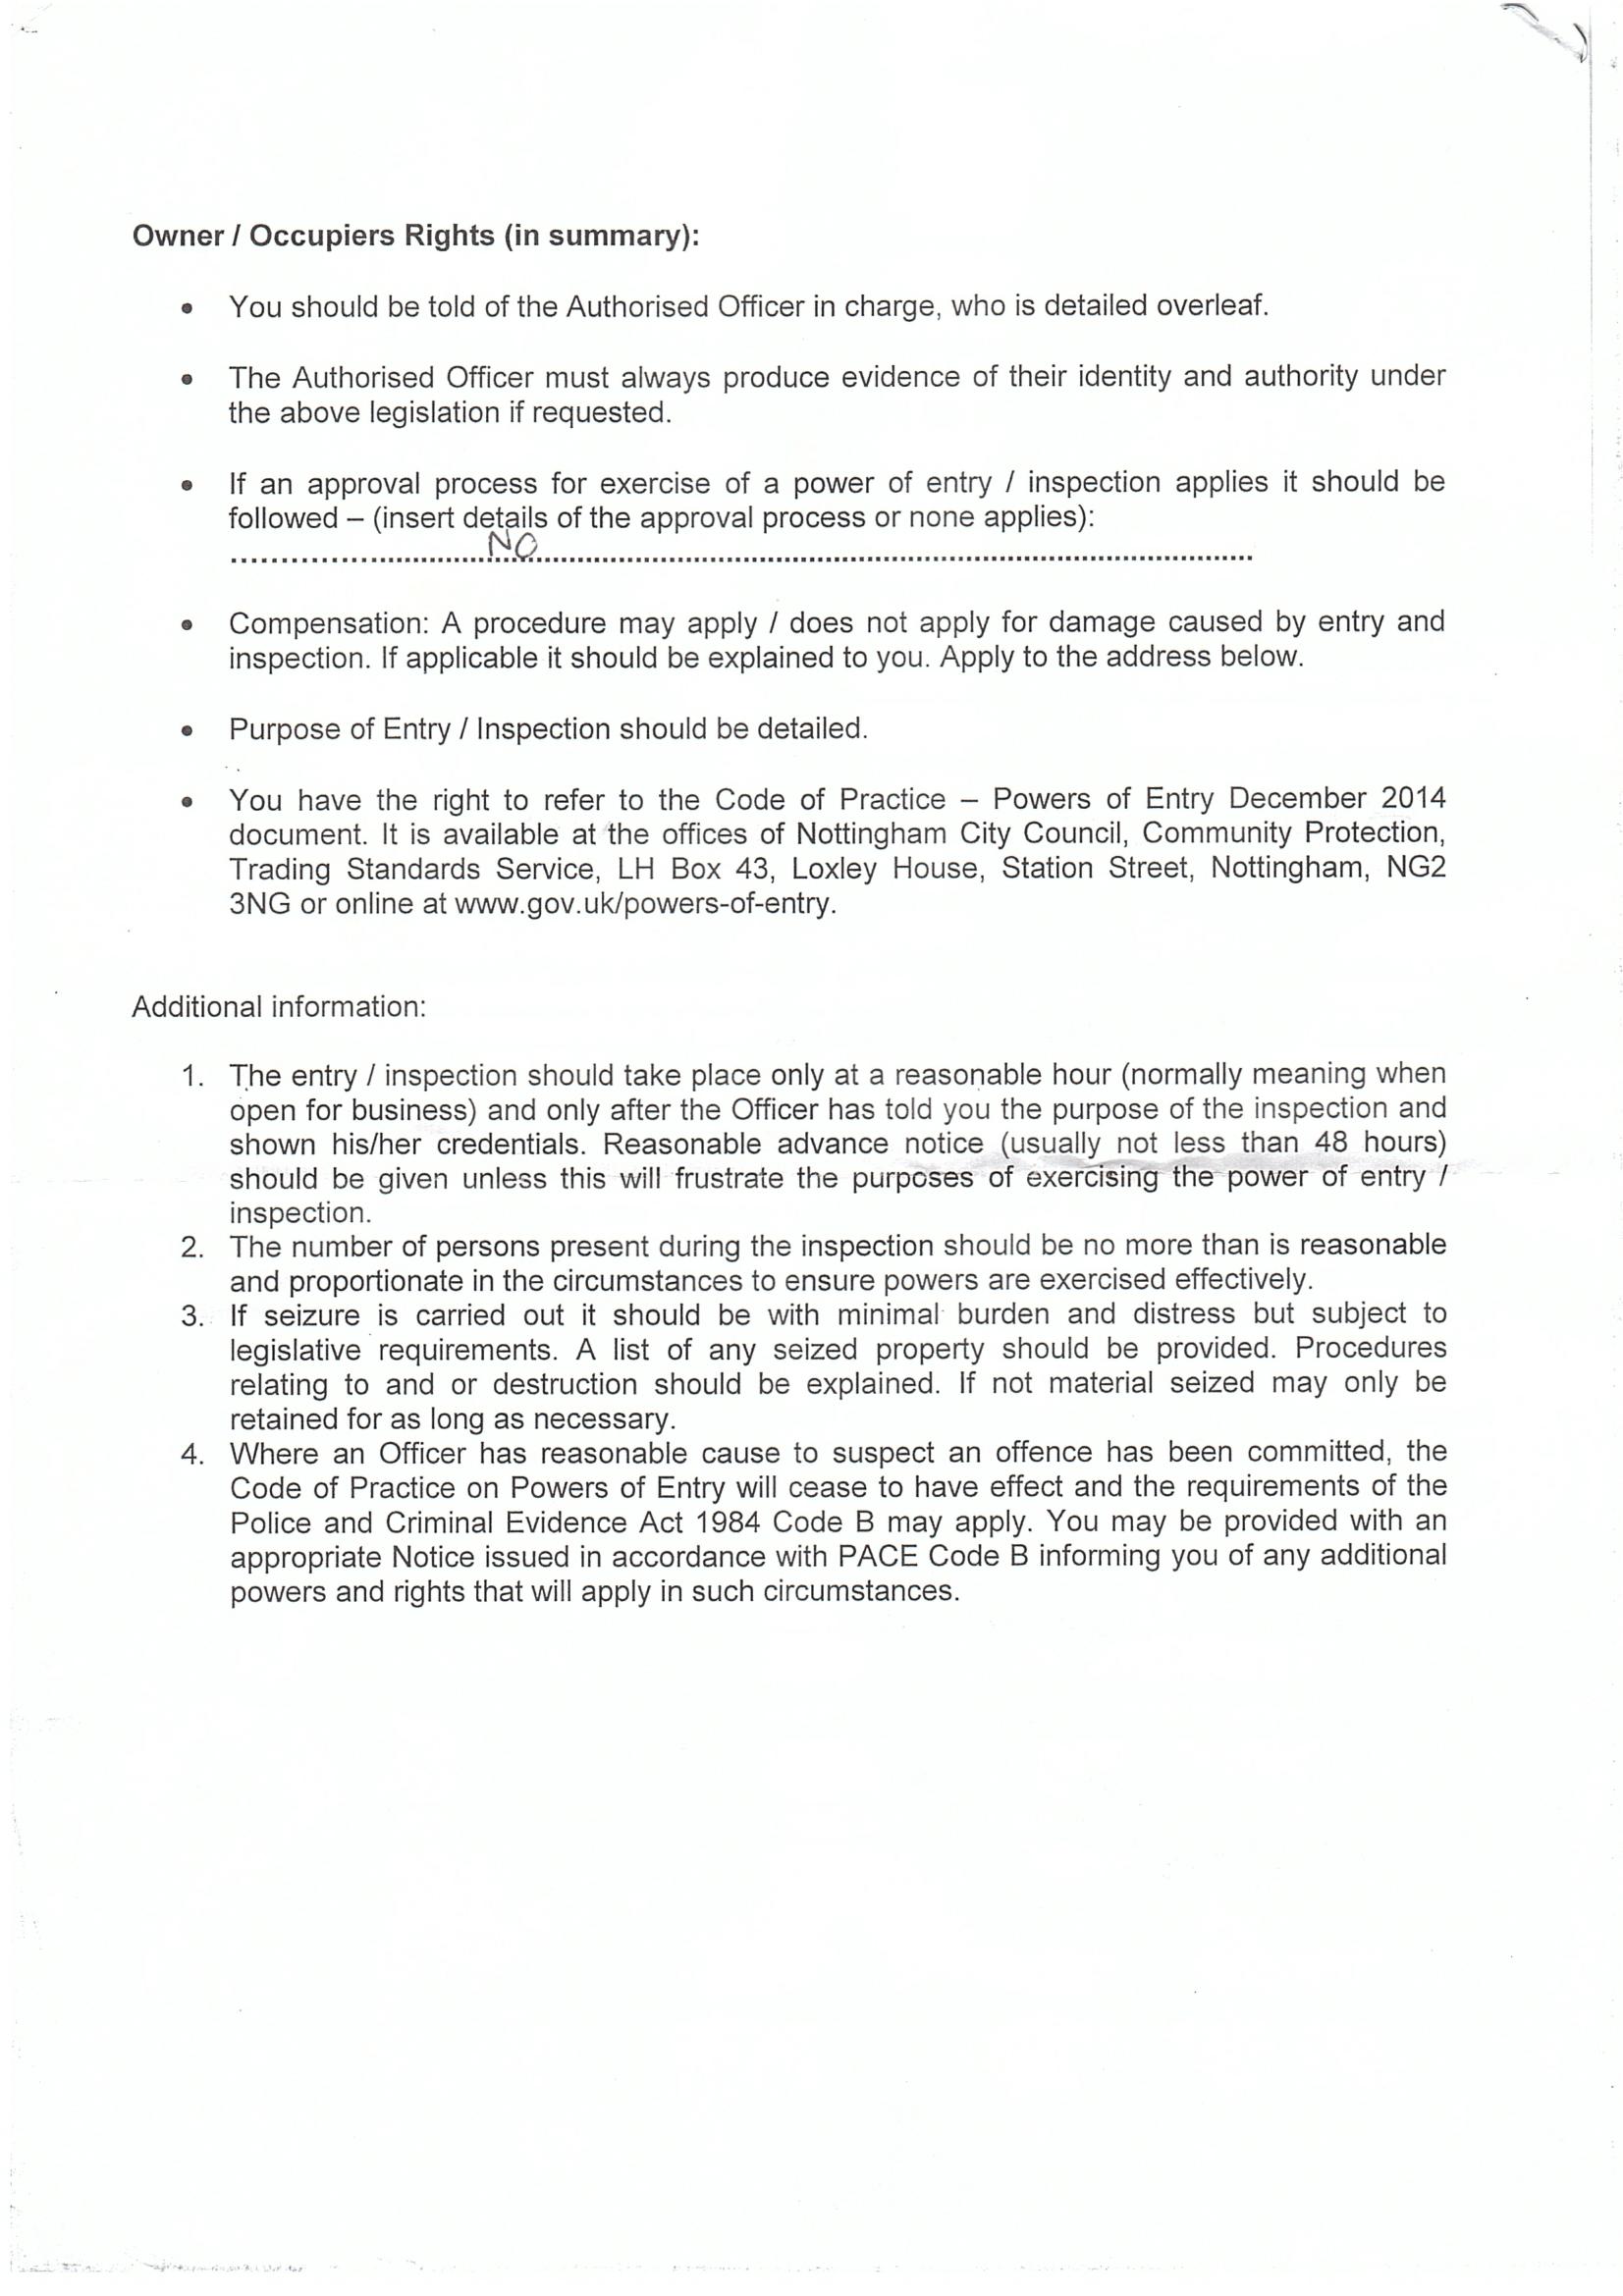 Trading Standard p2-1